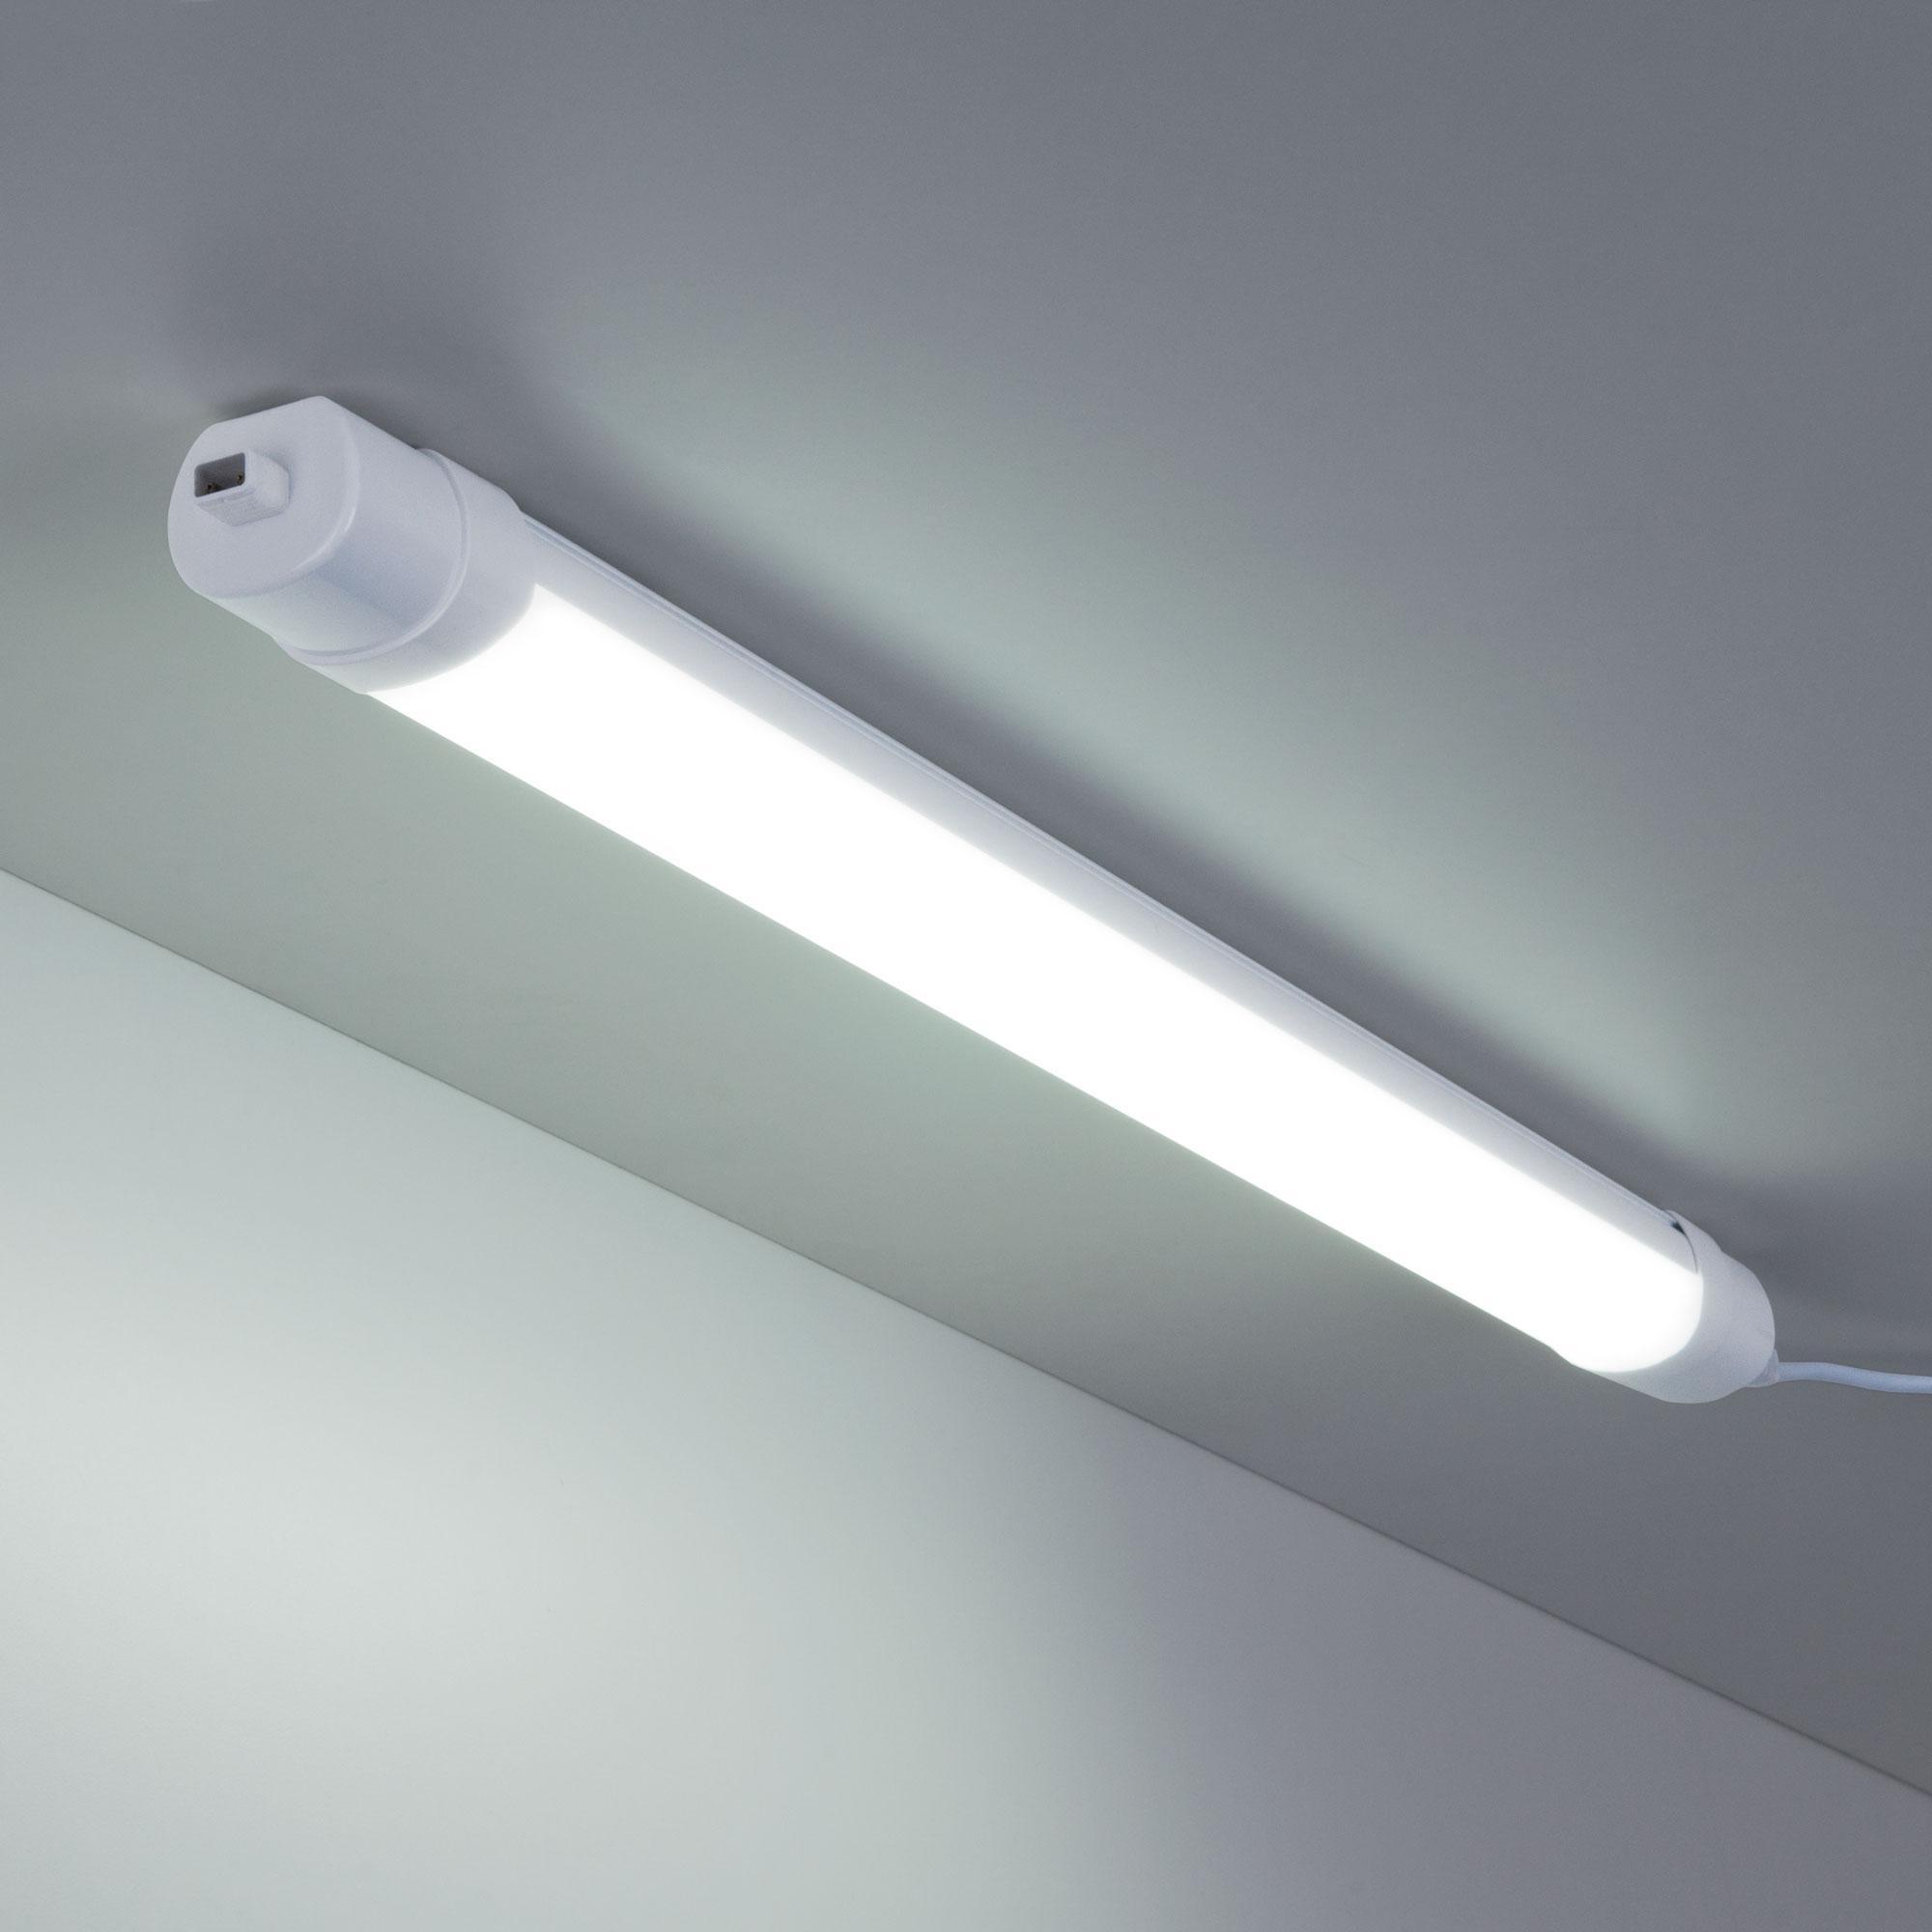 LED Светильник 60 см 18 Вт Connect